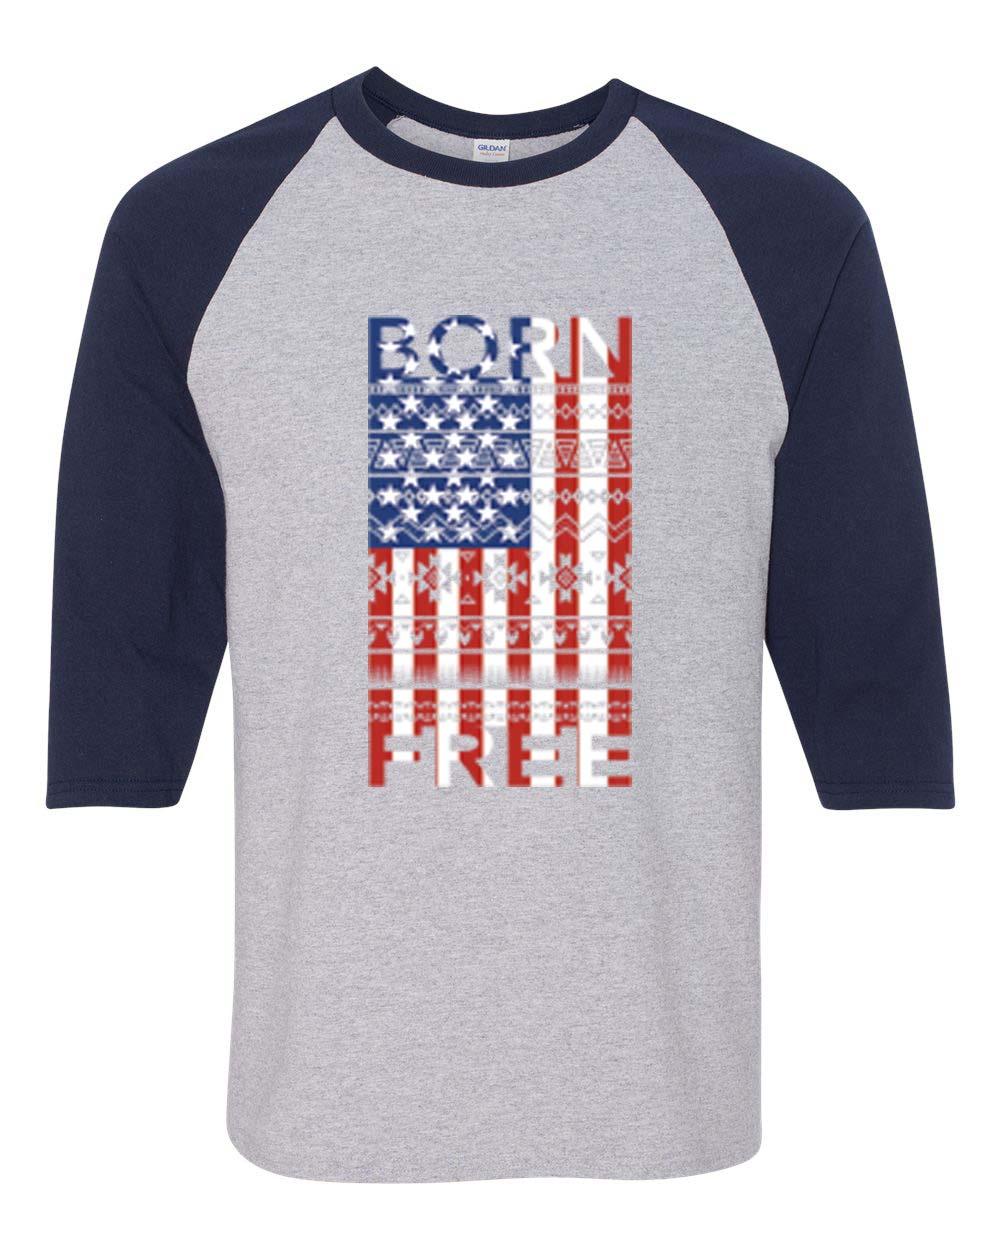 Born Free American Flag Distressed Patriotic 3 4 Raglan